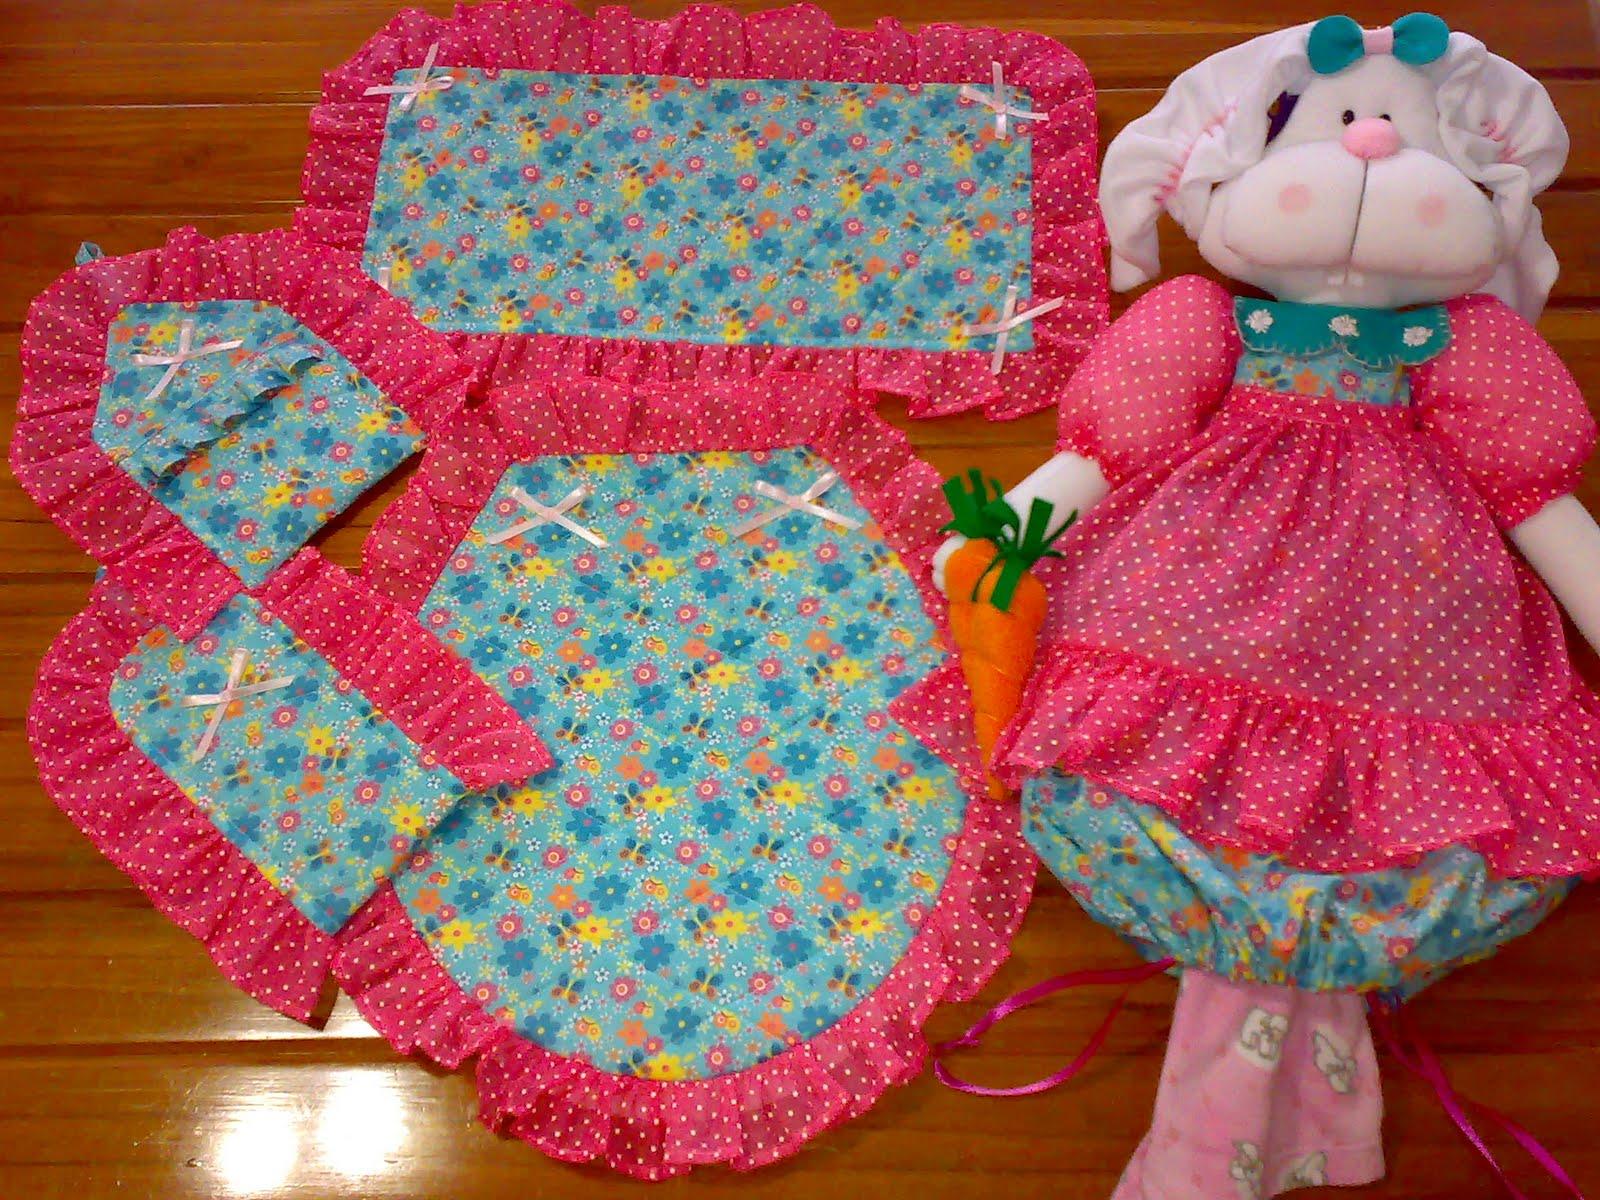 Set De Baño En Crochet:De Bano Para Ninas